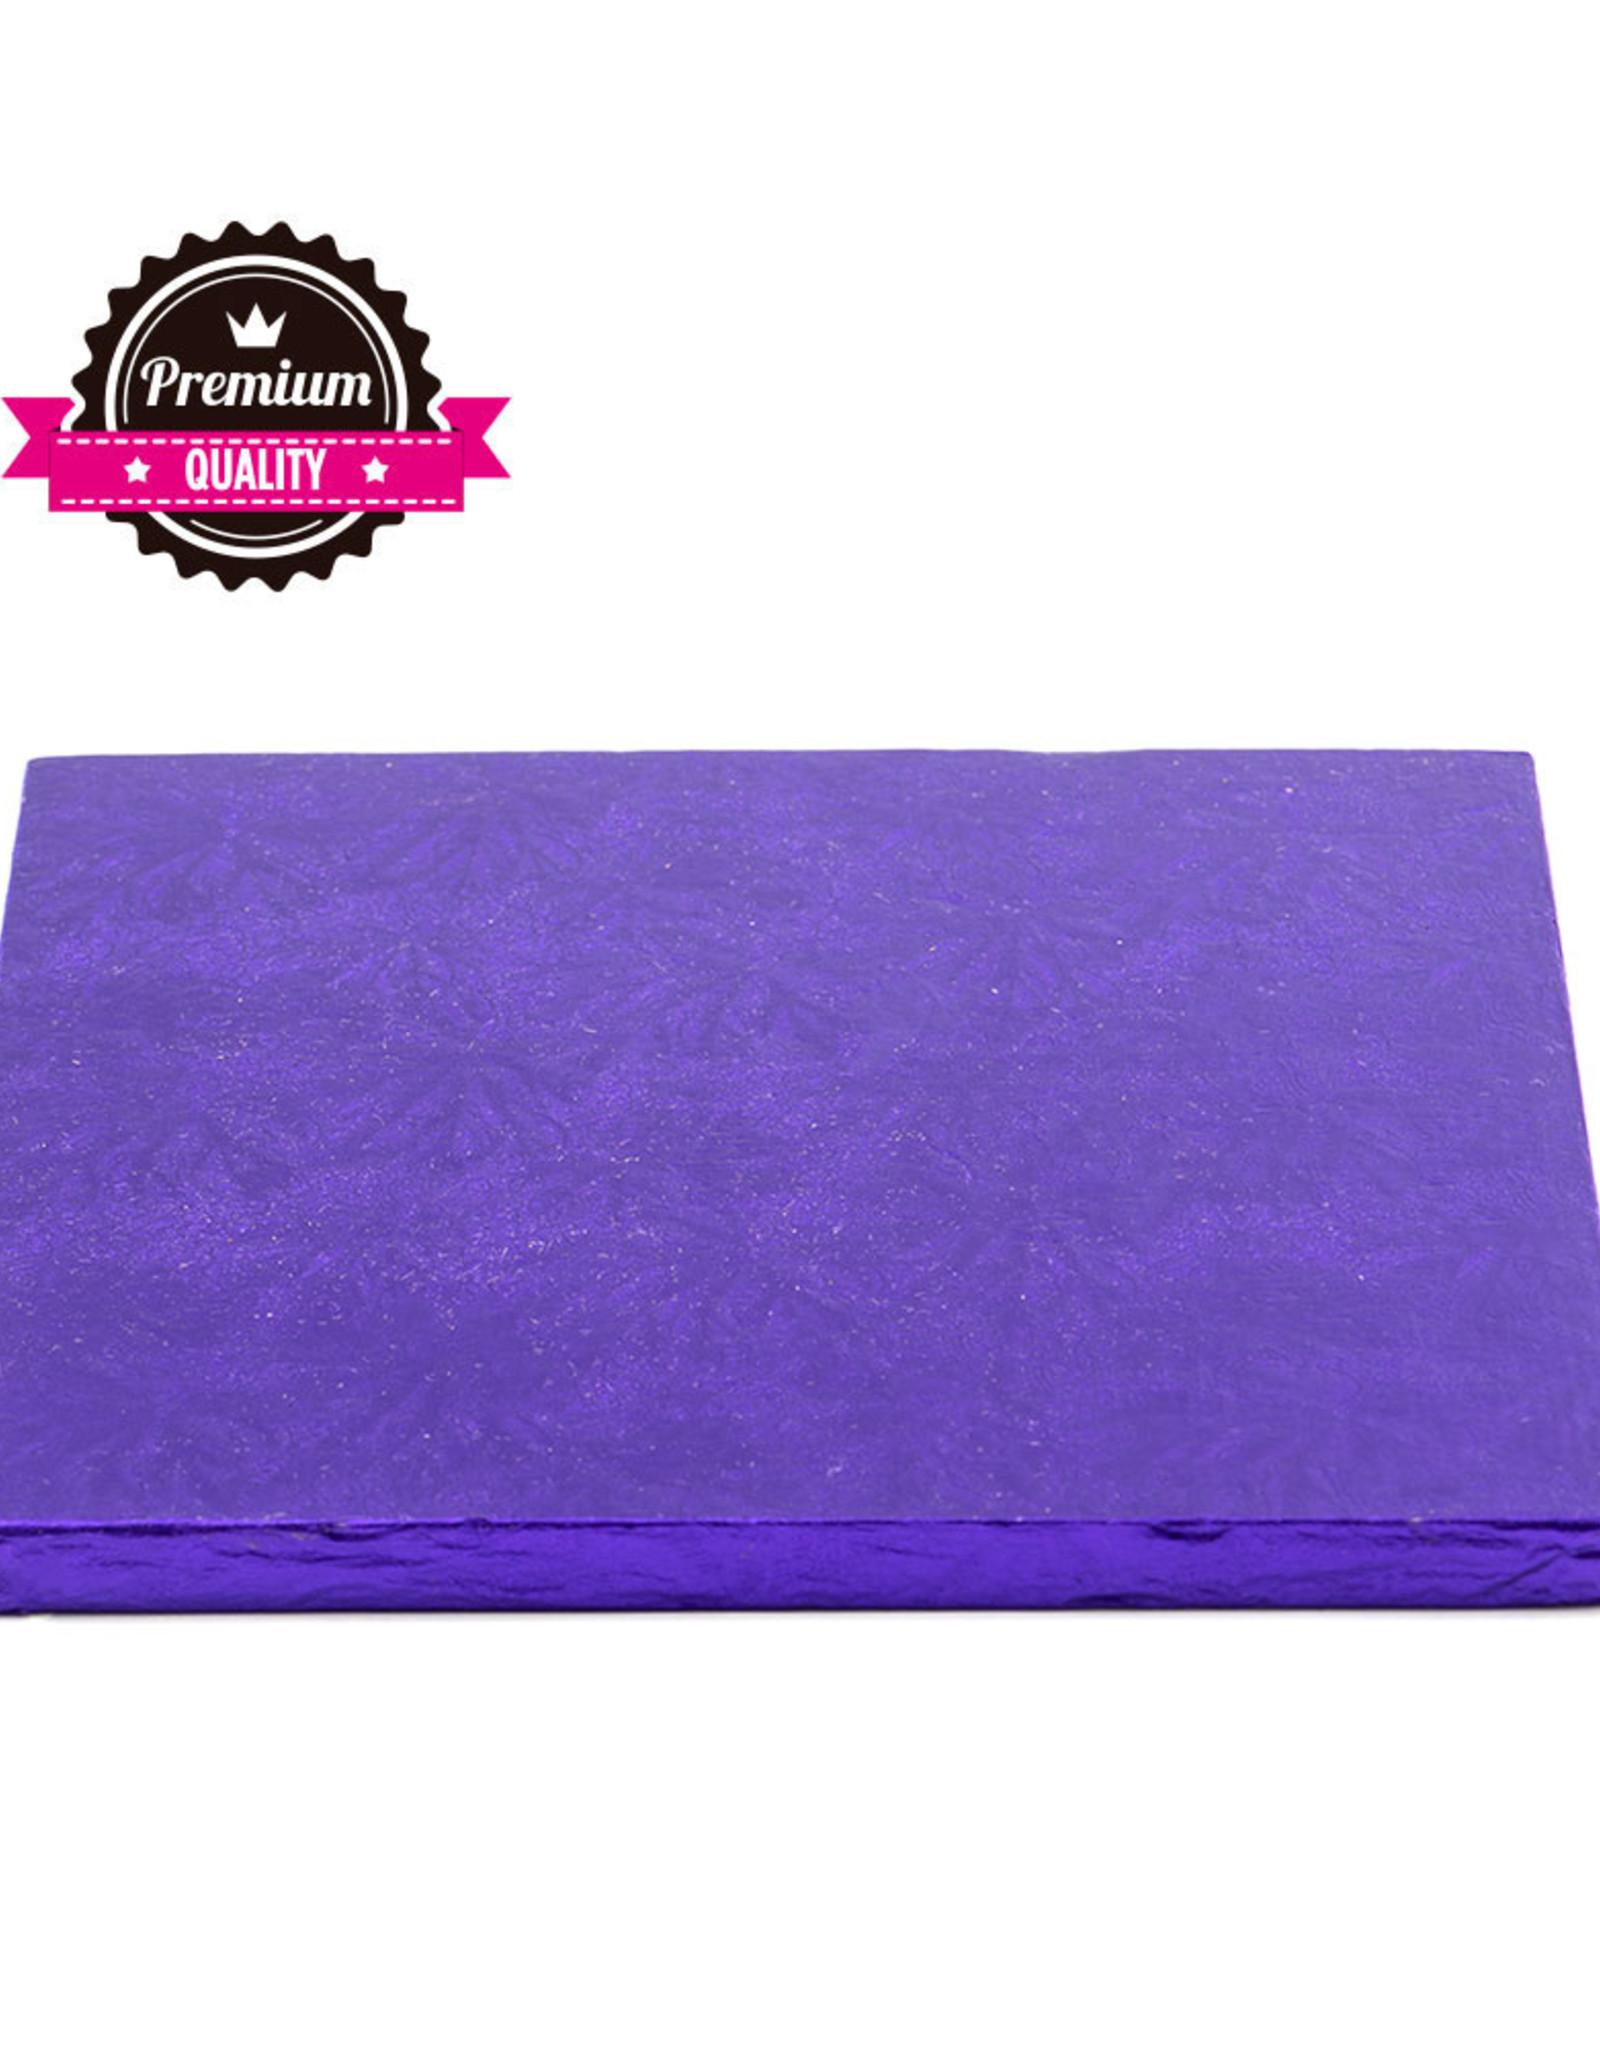 Cake Drum Vierkant 15cm Violet